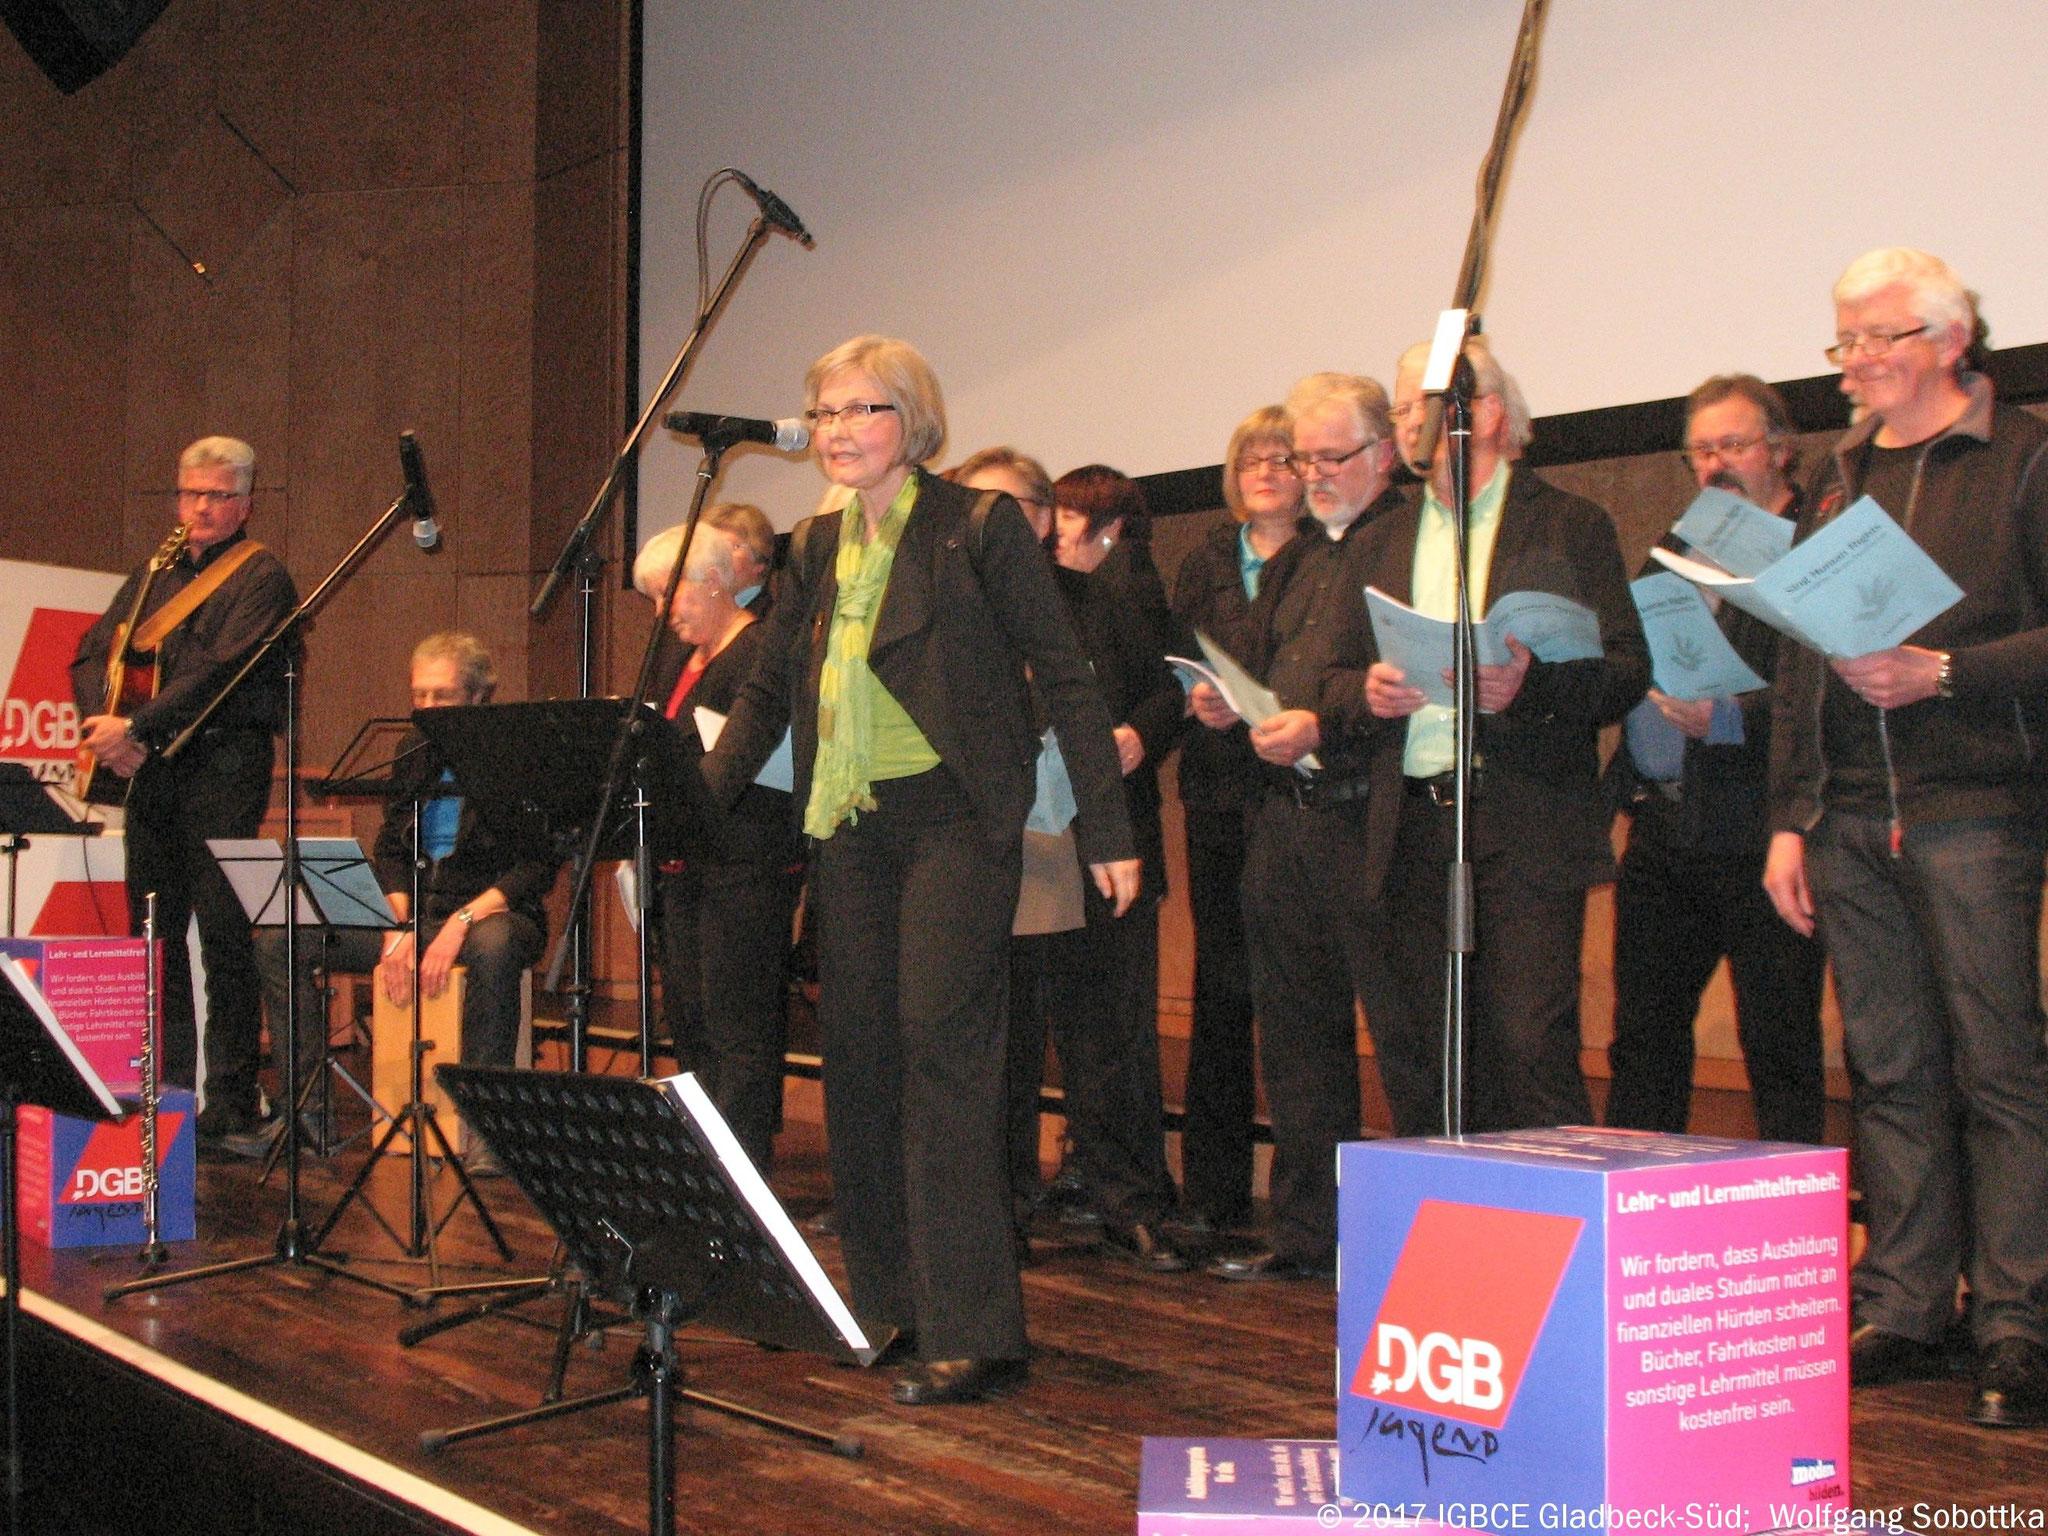 DGB Neujahrsempfang in Gladbeck. Fotos: IG BCE Gladbeck-Süd, Wolfgang Sobottka